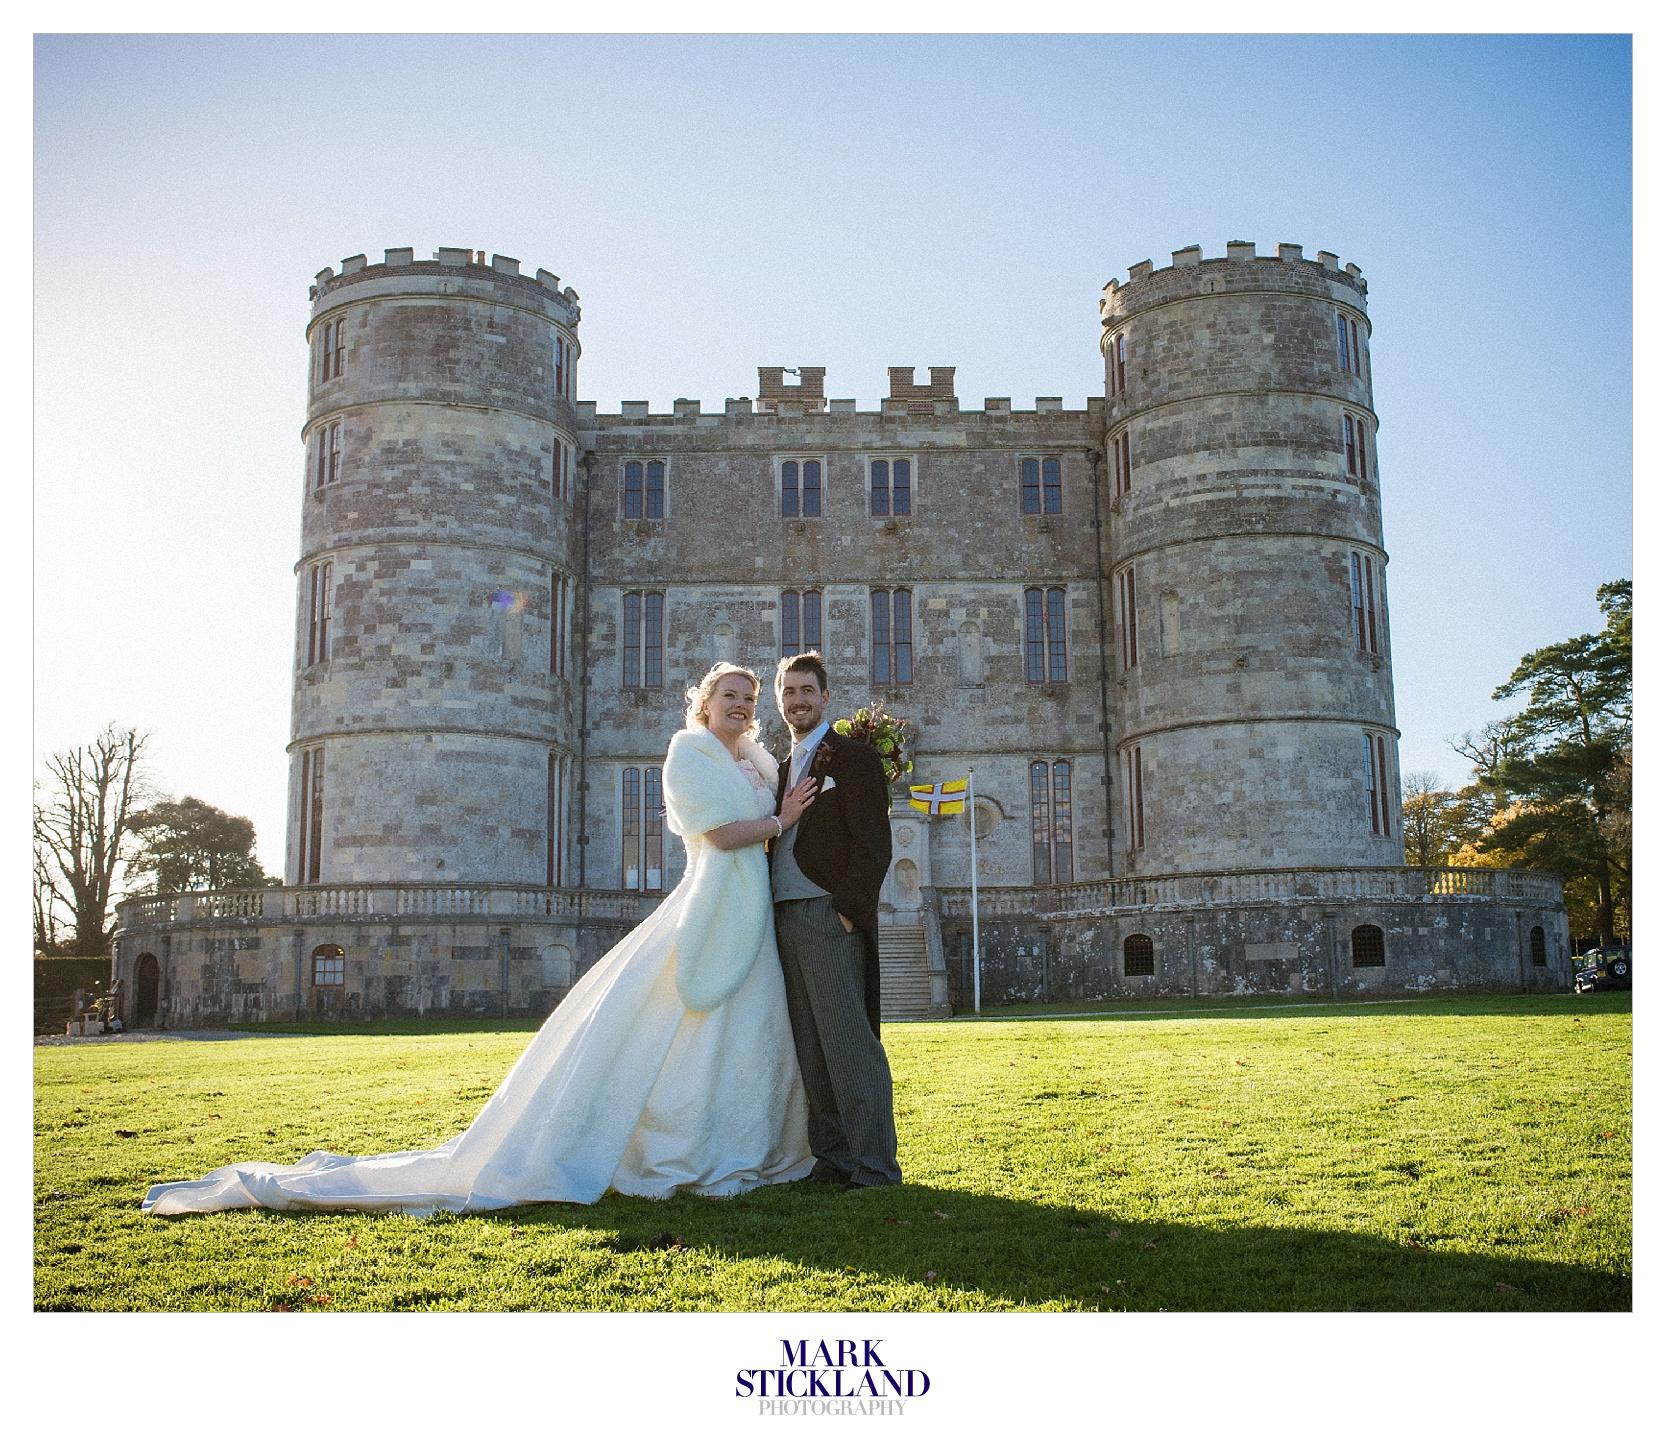 lulworth_castle_wedding_dorset_mark stickland photography.26